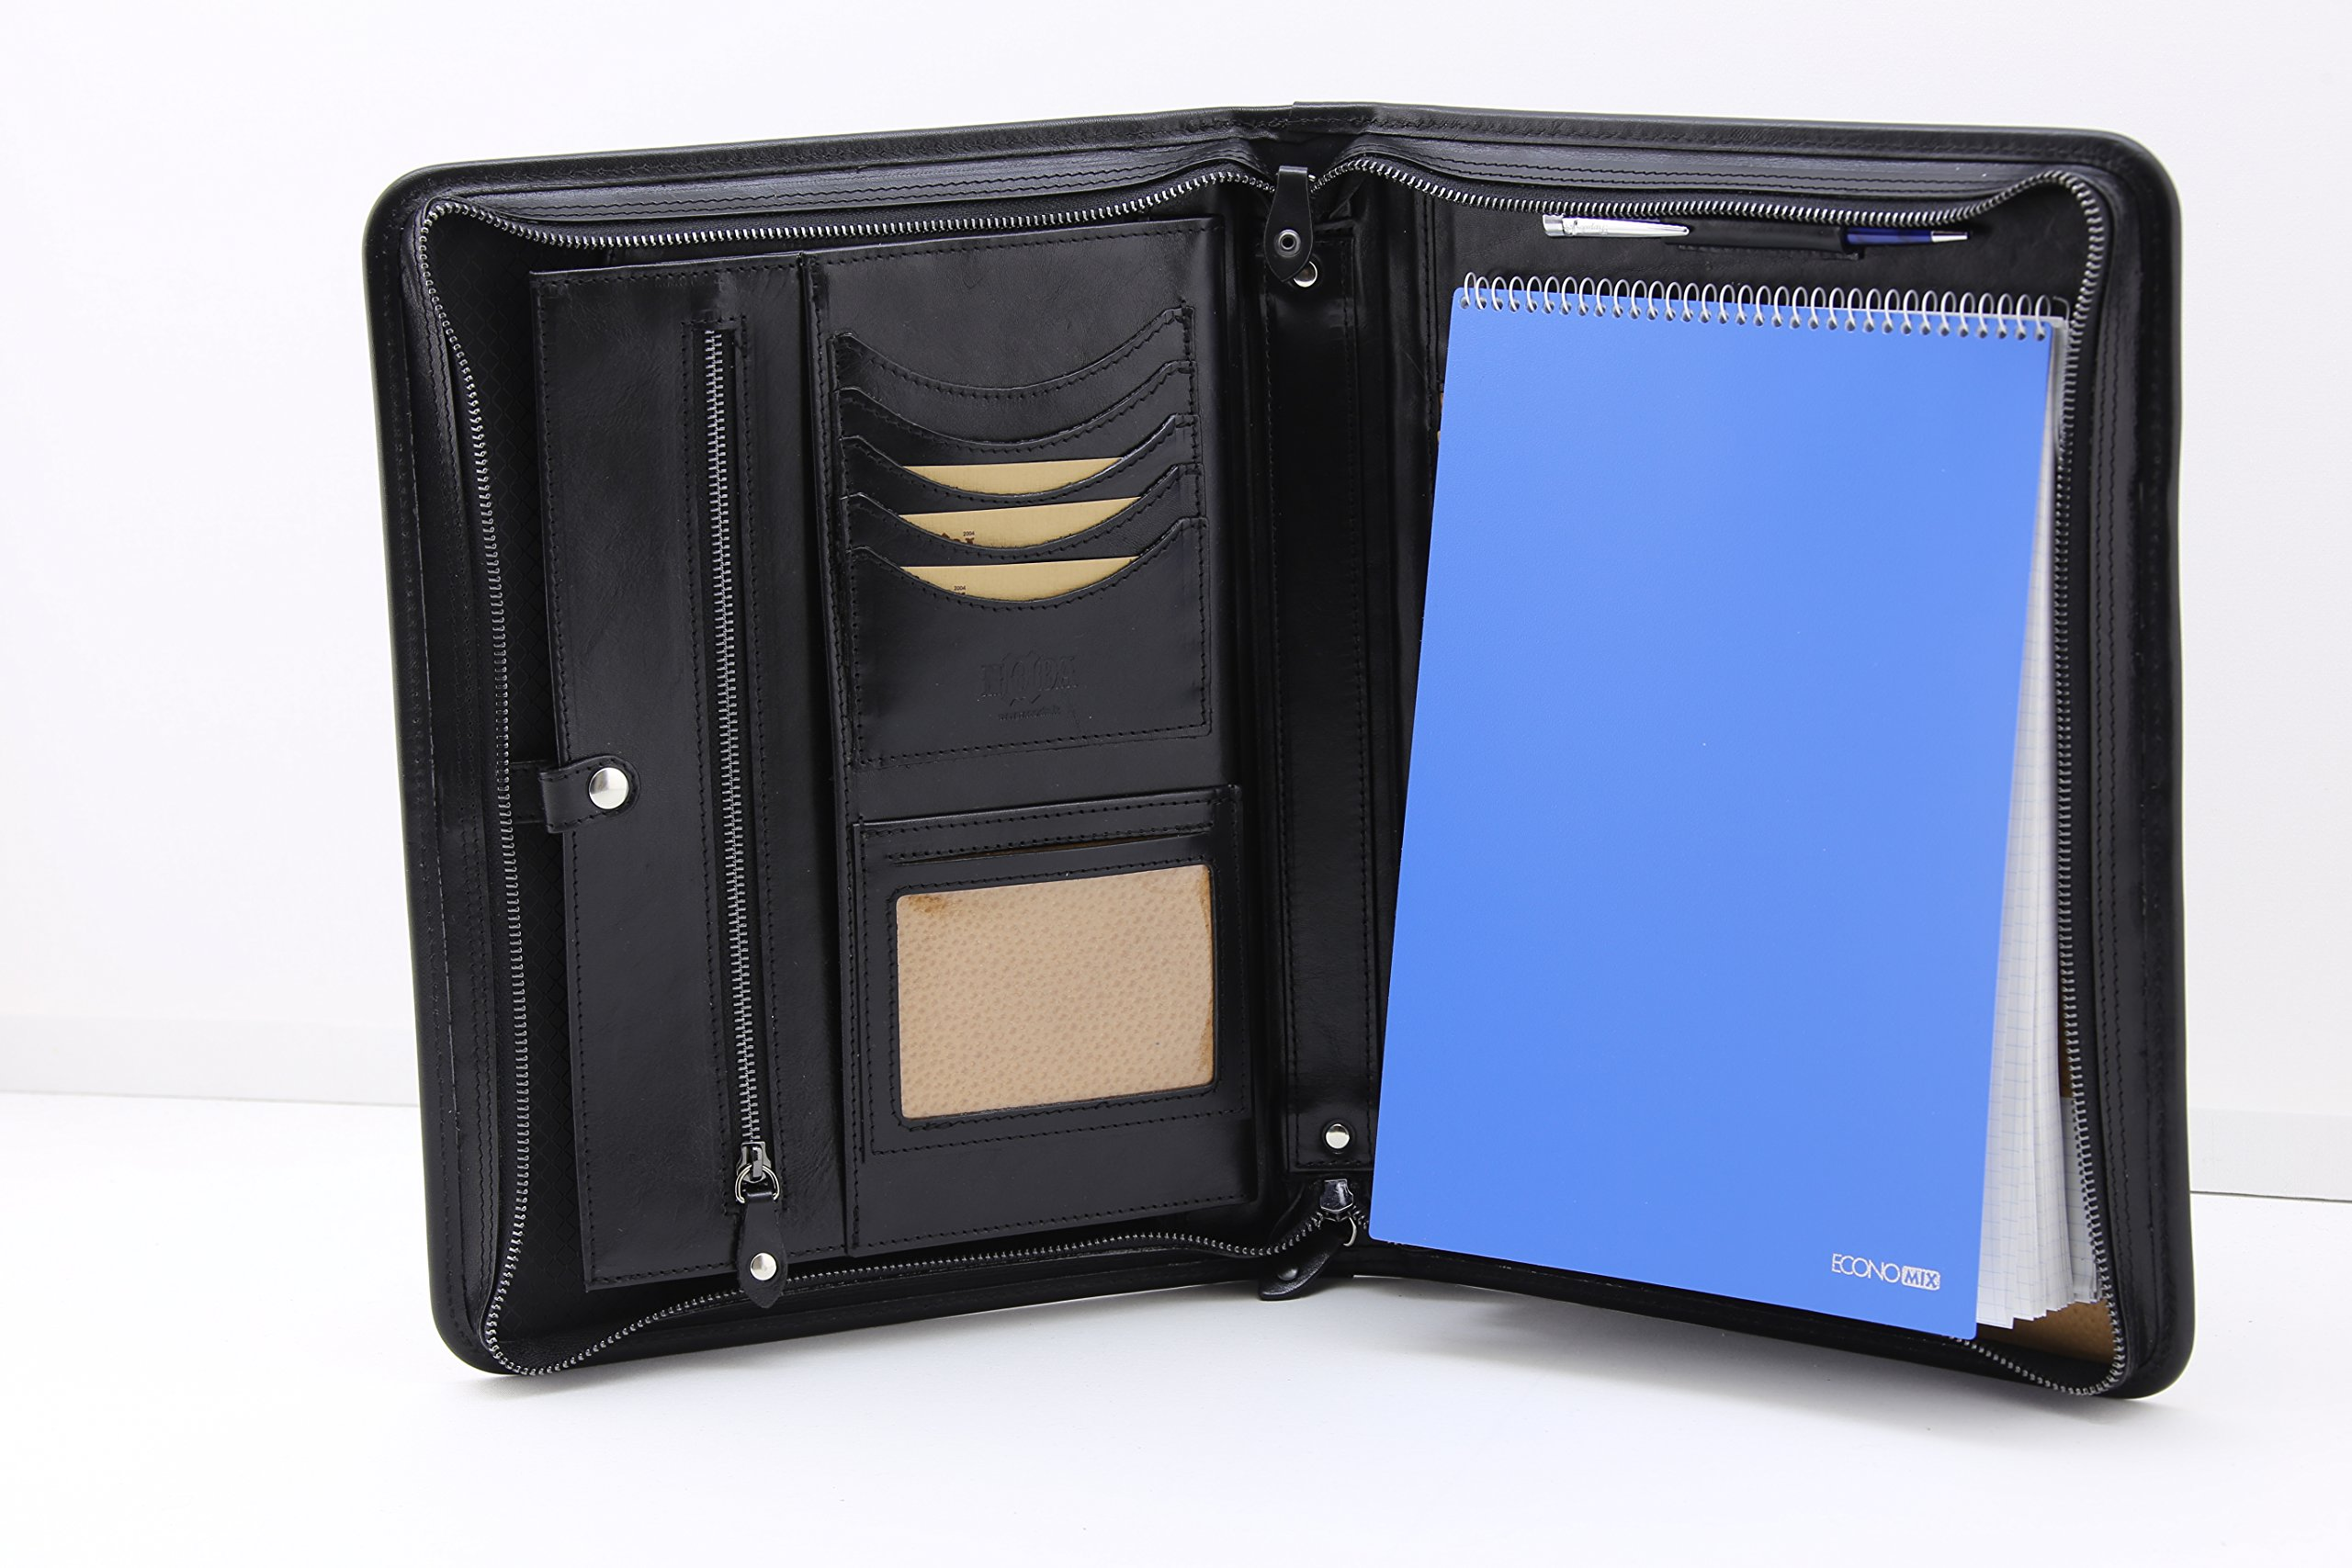 Noda Executive Leather Padfolio (Black) Professional Business Portfolio w/ Zippered Closure | Resume, Document, Notepad, Tablet, Writing Pad Organizer | Men, Women